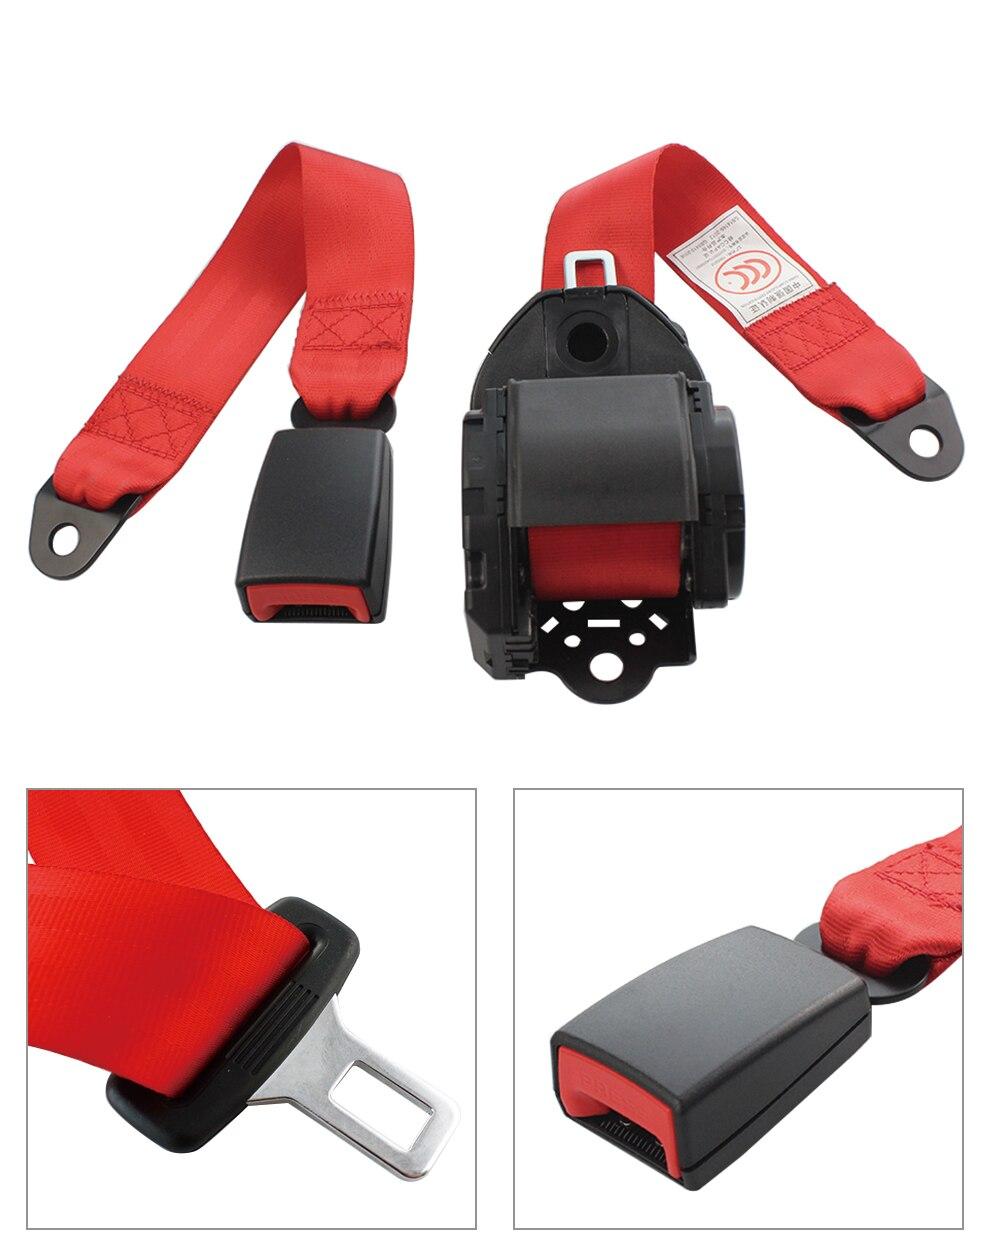 Cinghia di sicurezza con chiusura di emergenza cintura di sicurezza per auto a 3 punti retrattile rossa blu con viti cintura di sicurezza automatica